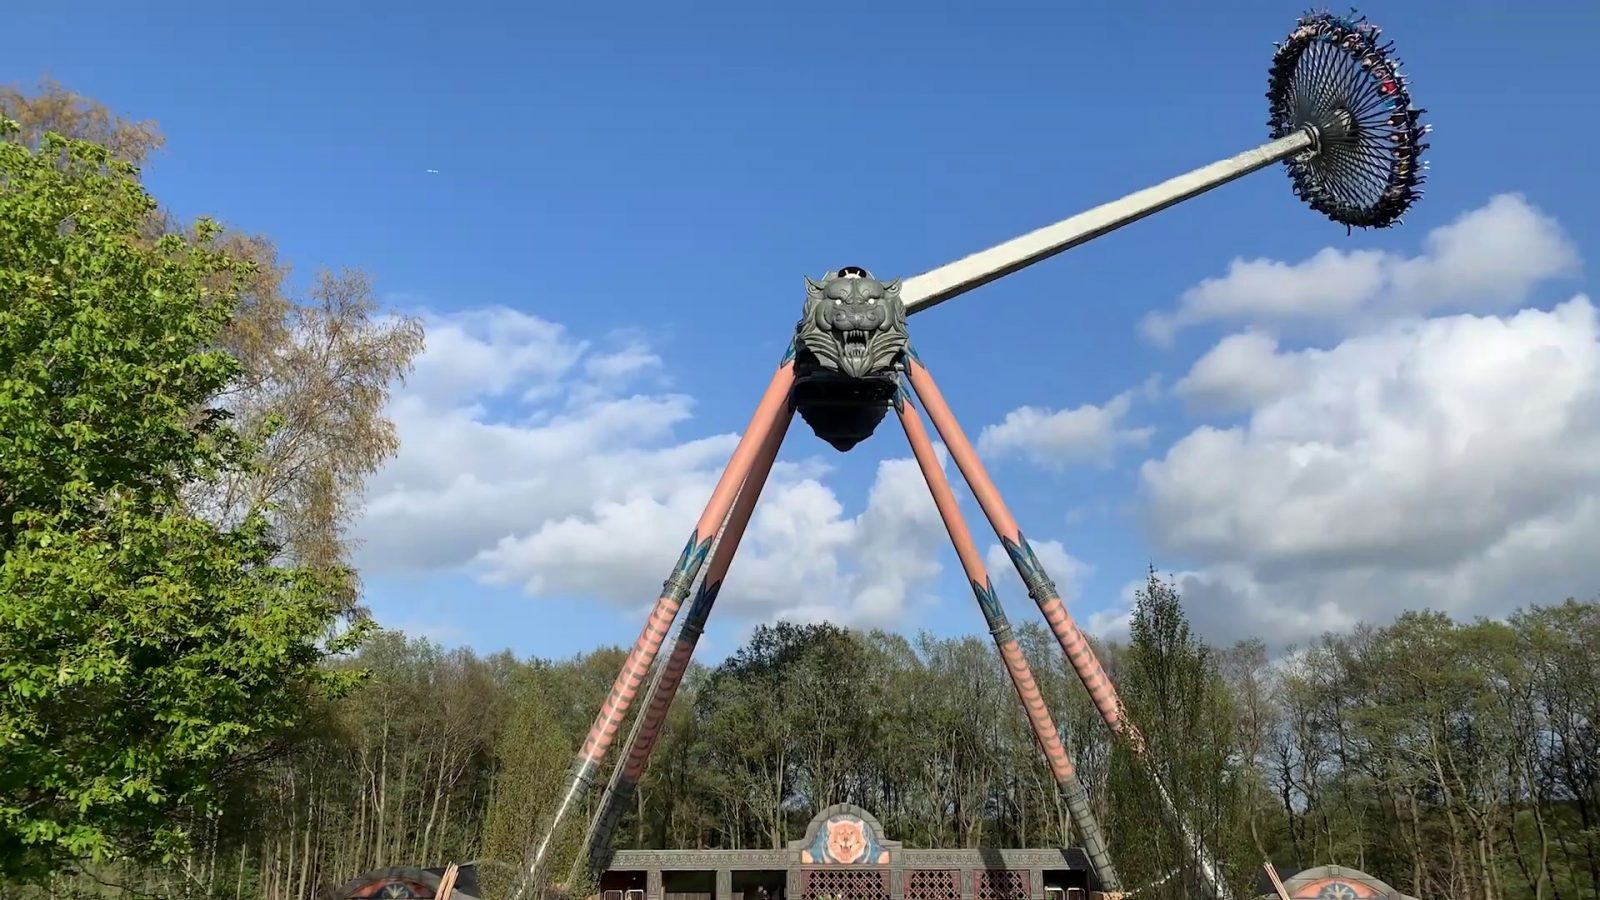 Tigeren Intamin Djurs Sommerland Gyro Swing